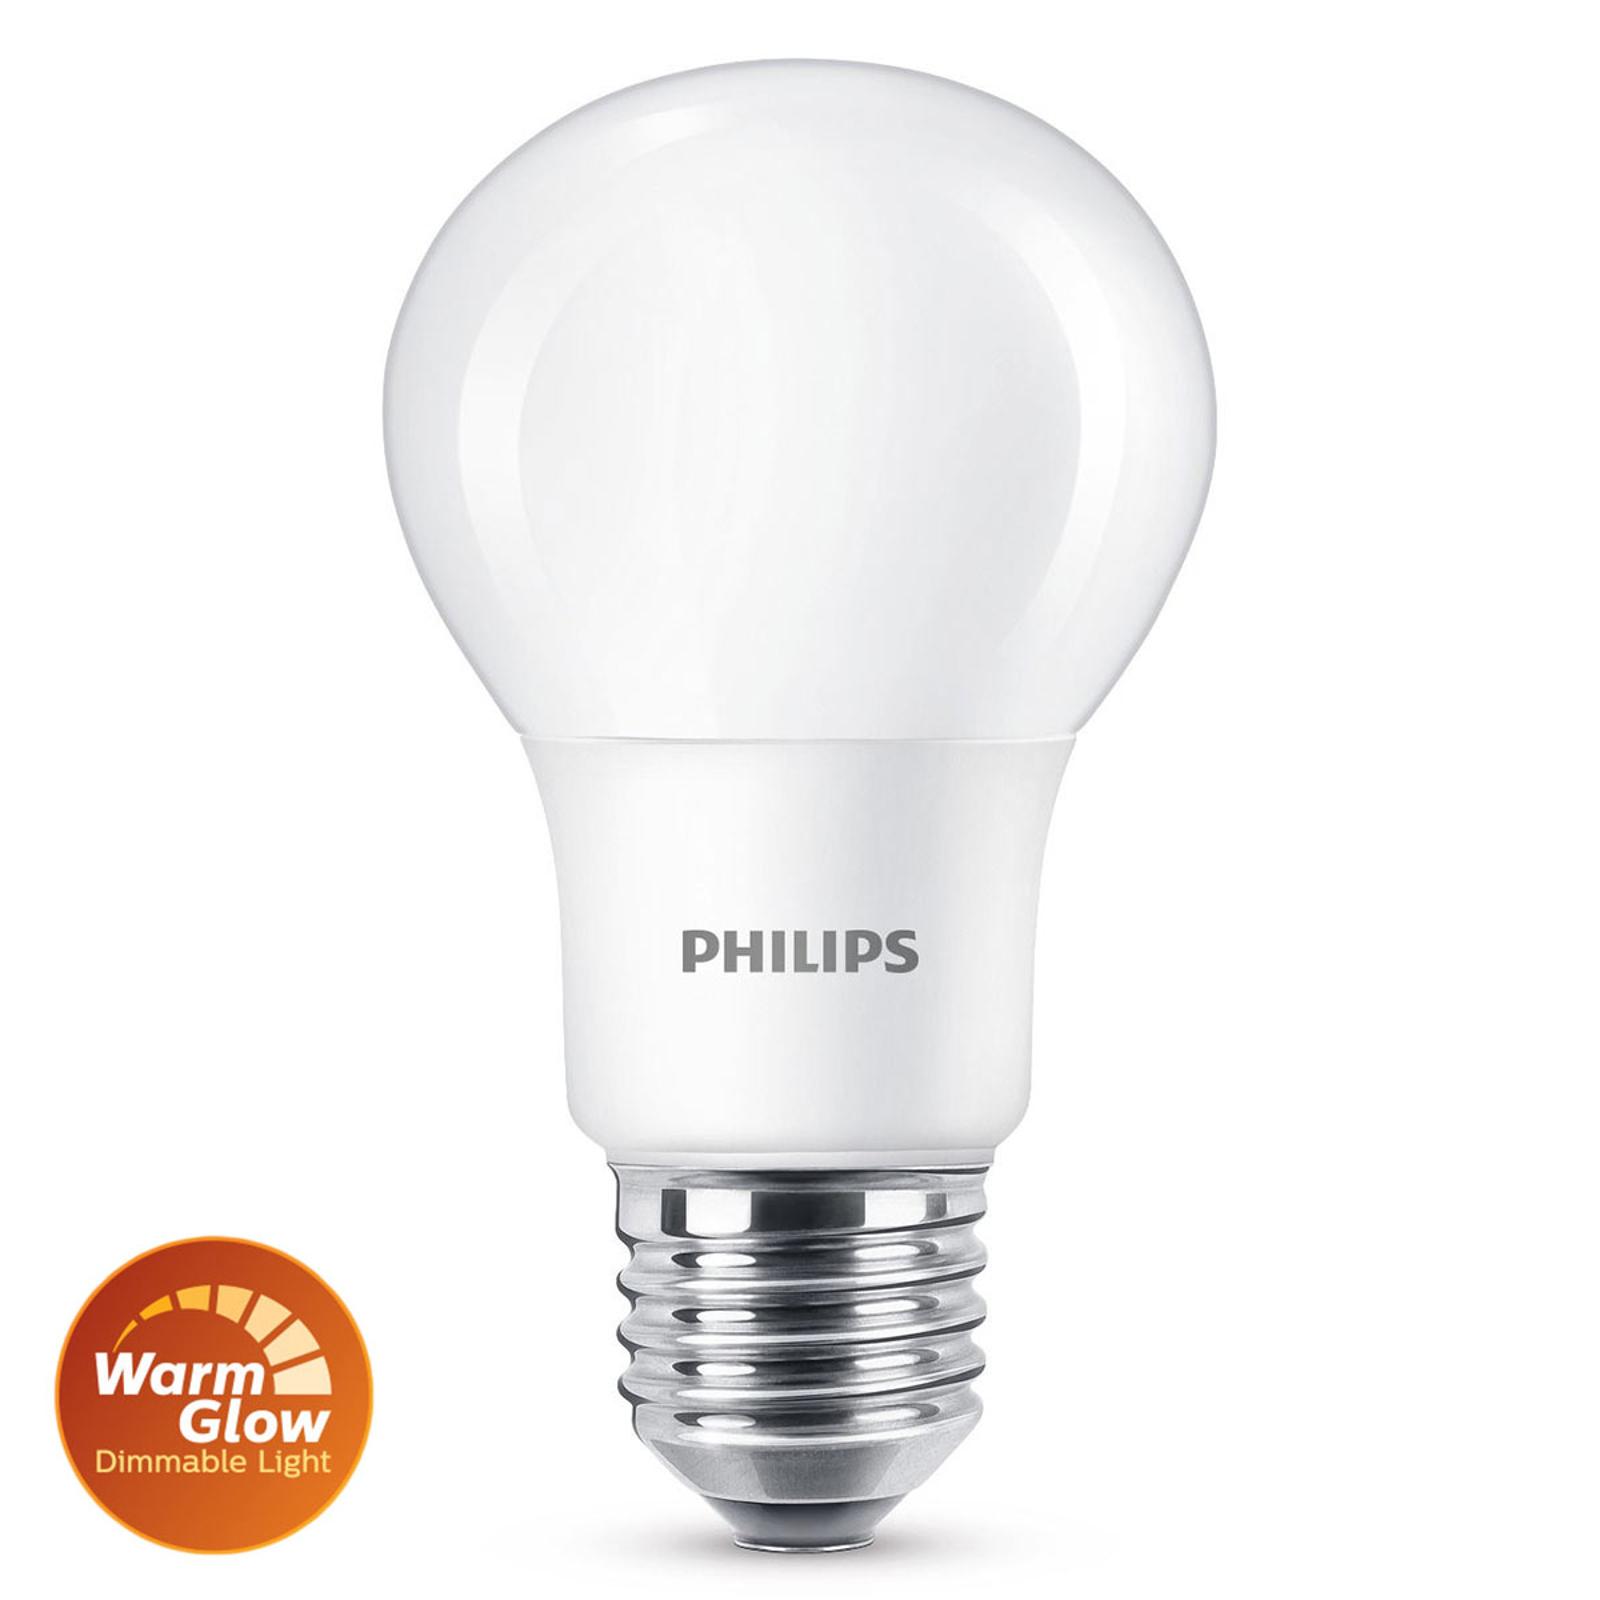 Philips E27 LED-Lampe WarmGlow 3,5 W matt, dimmbar